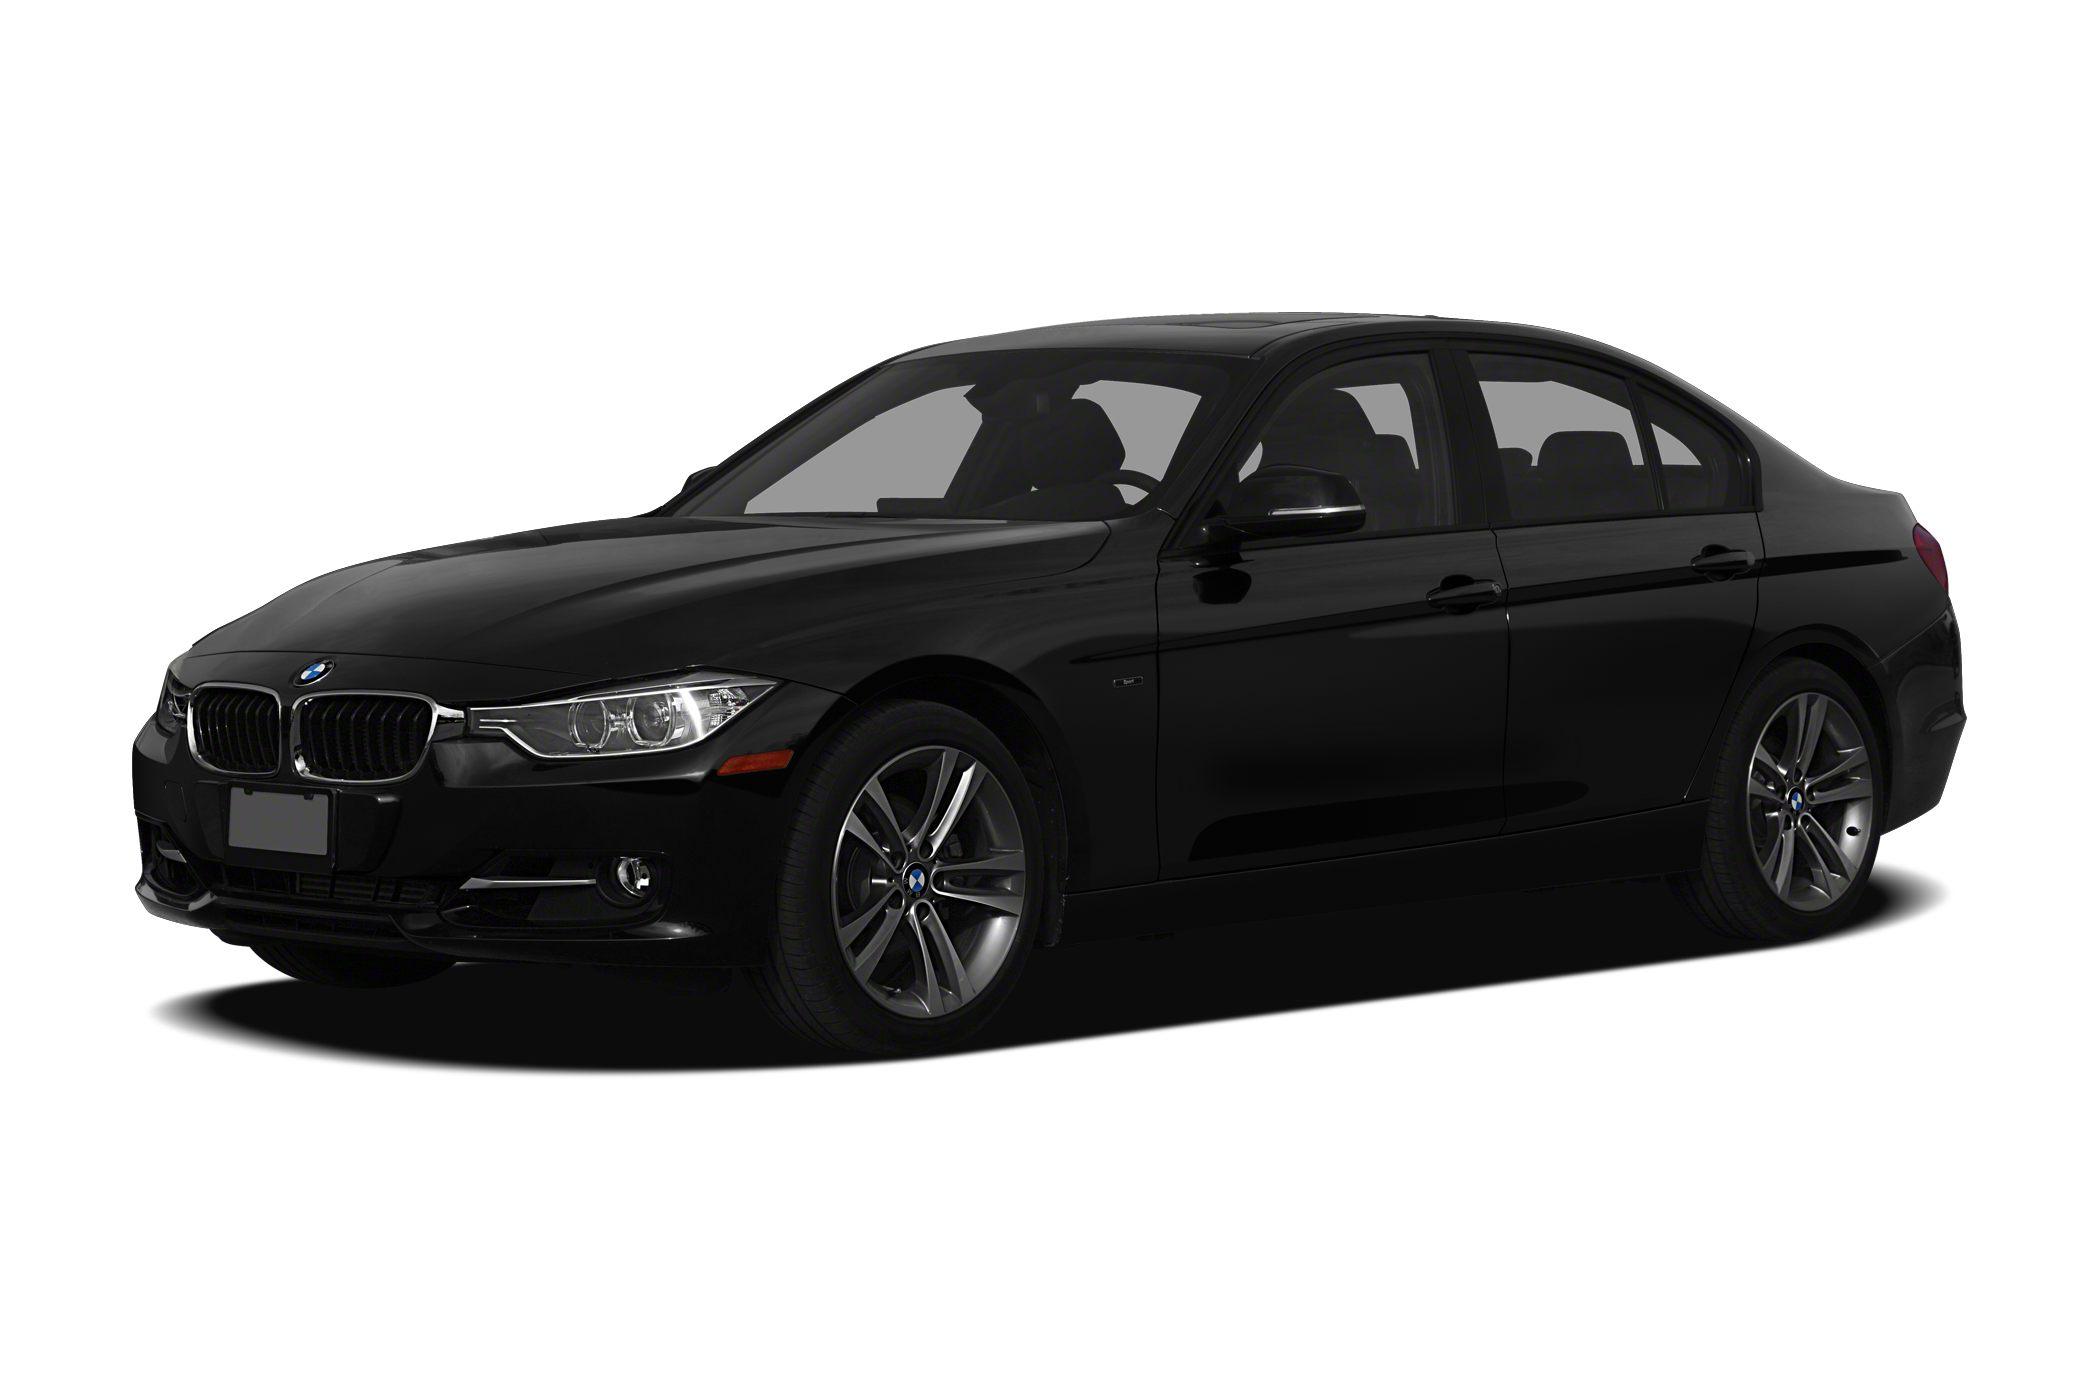 2013 BMW 320 Information